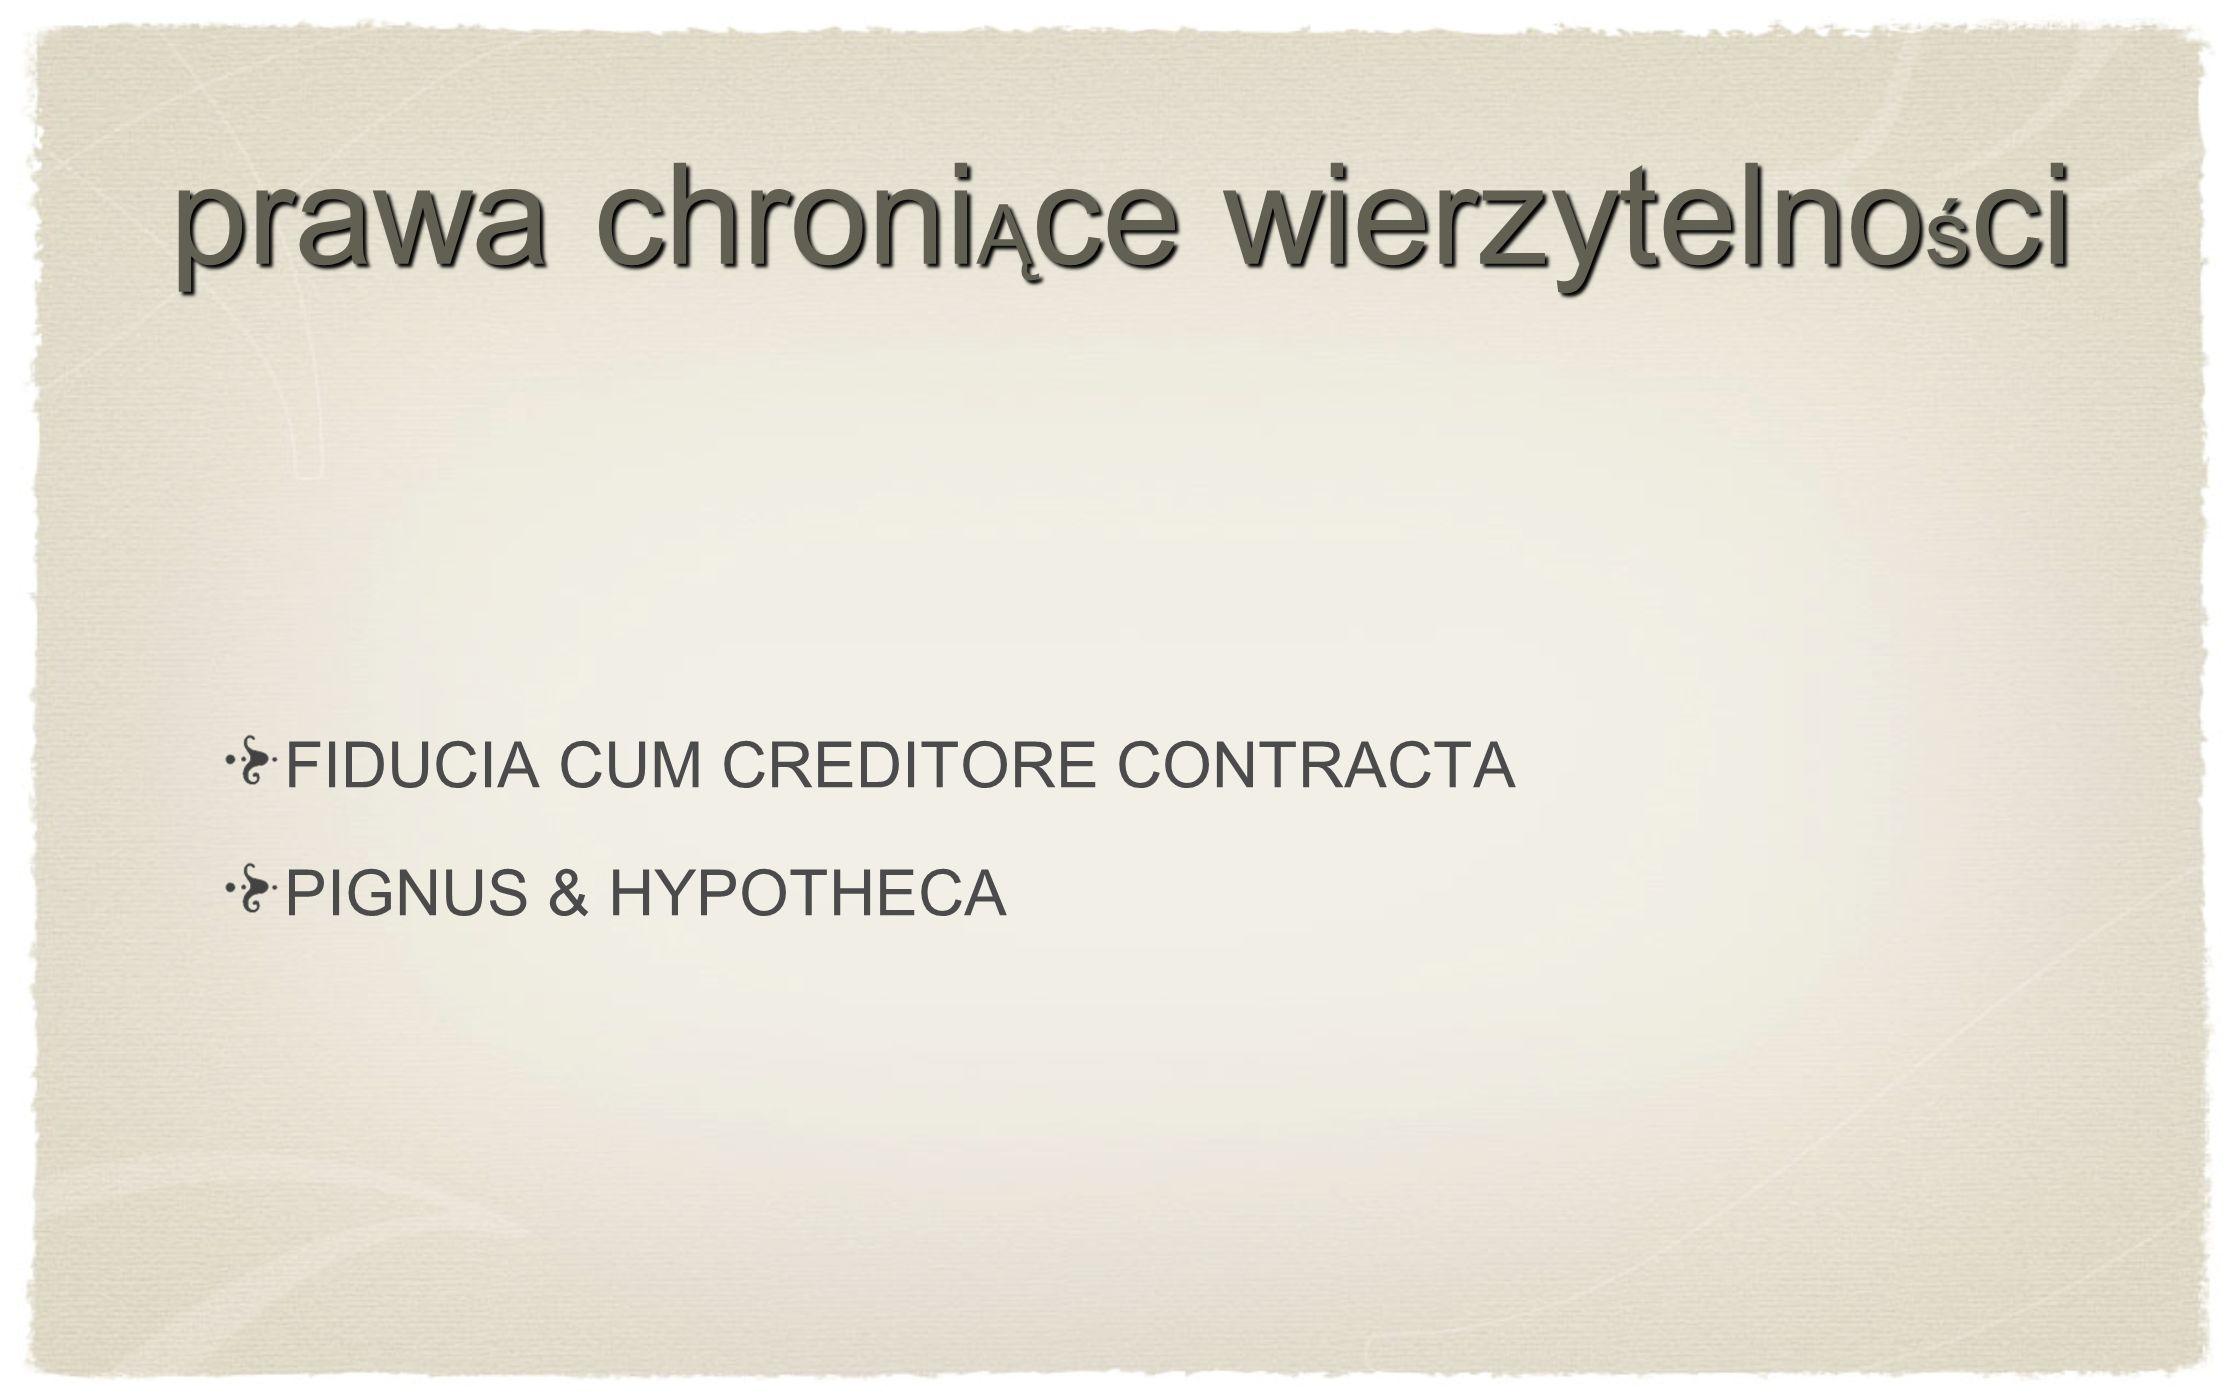 prawa chroni Ą ce wierzytelno ś ci FIDUCIA CUM CREDITORE CONTRACTA PIGNUS & HYPOTHECA